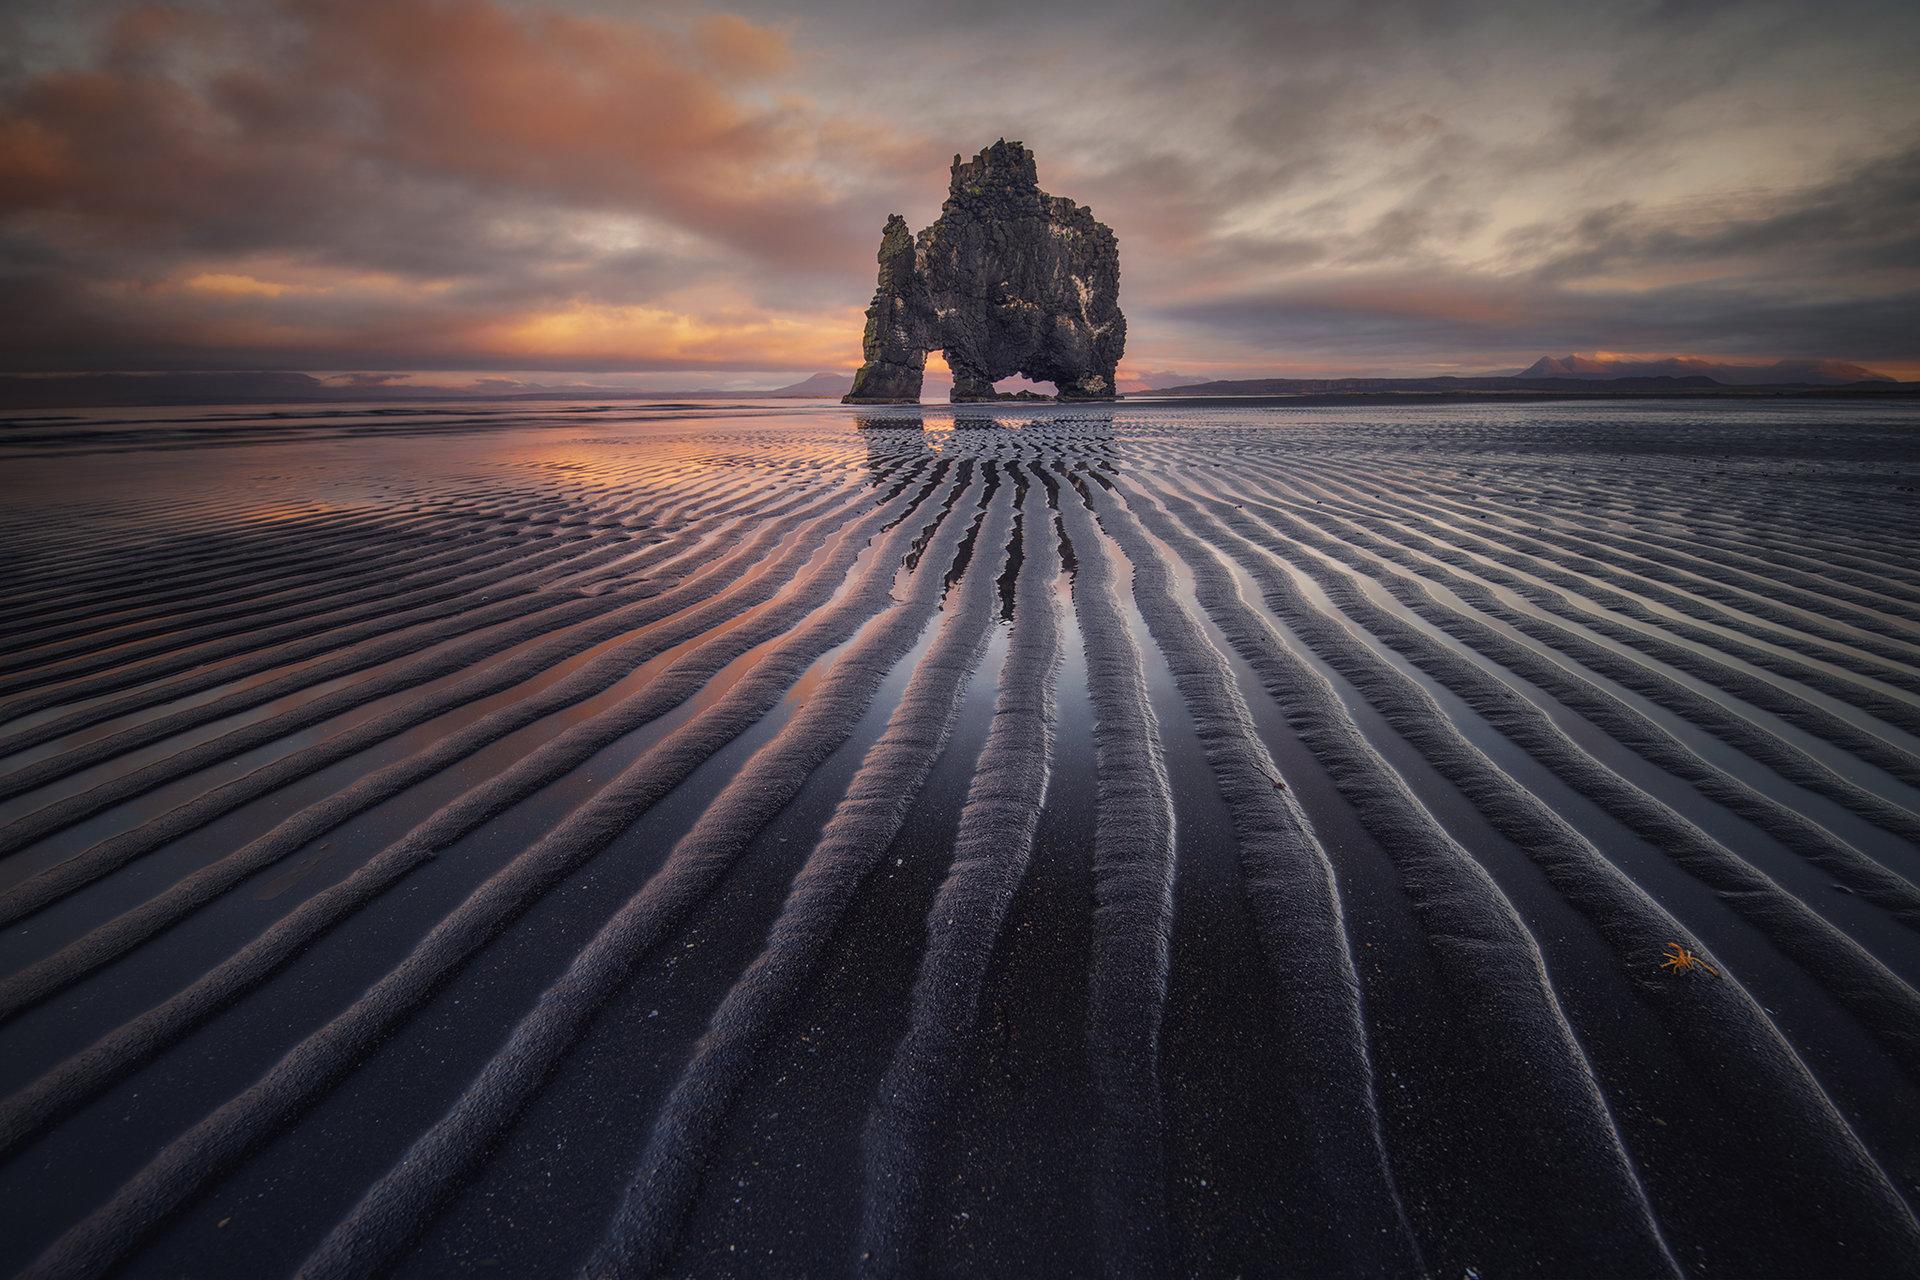 Paths | Author Генади Дочев - ArtistGND | PHOTO FORUM